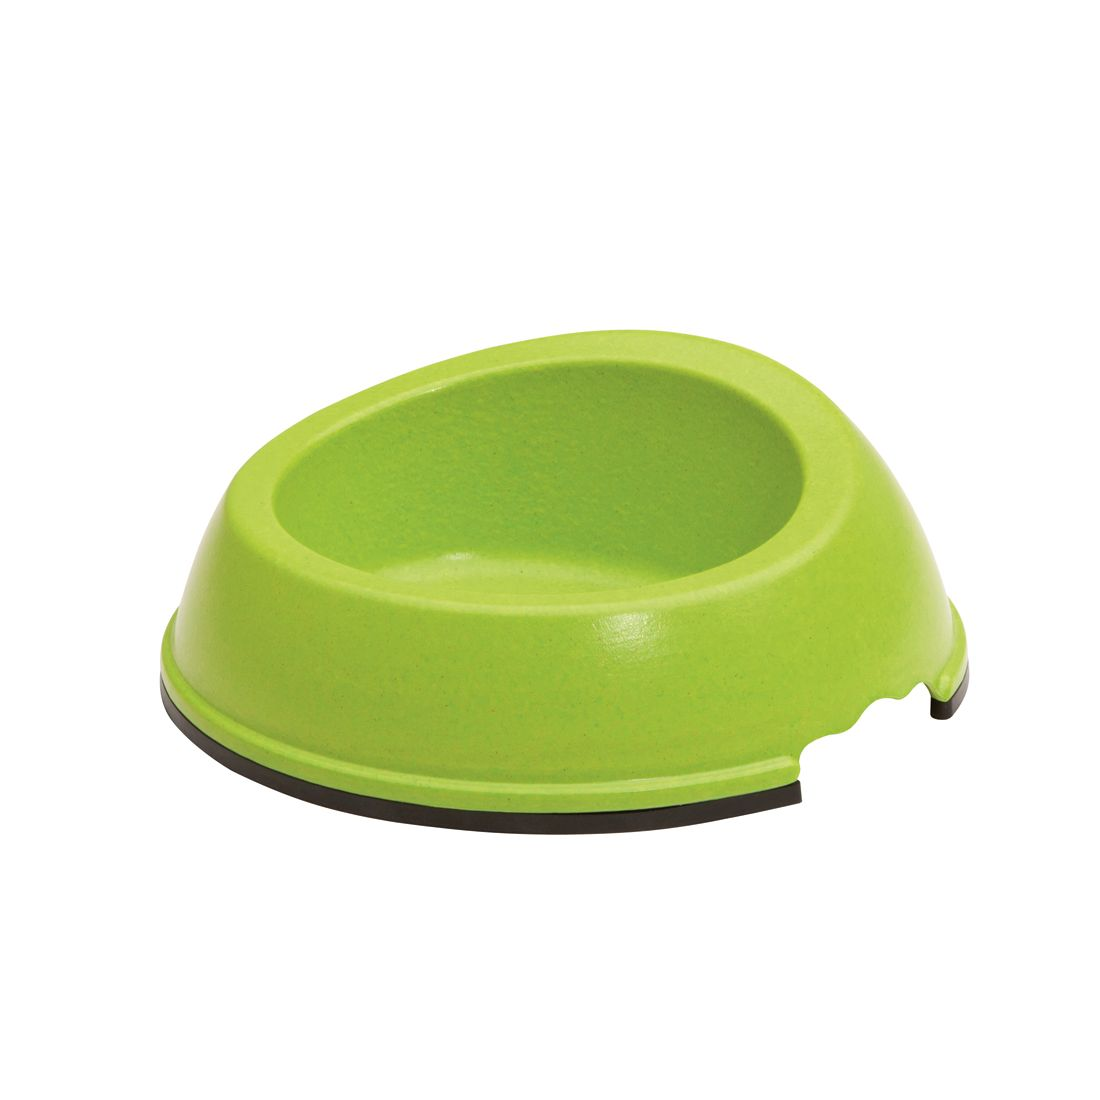 Maelson miska s protiskluzem - zelená - 20 x 20 x 7 cm